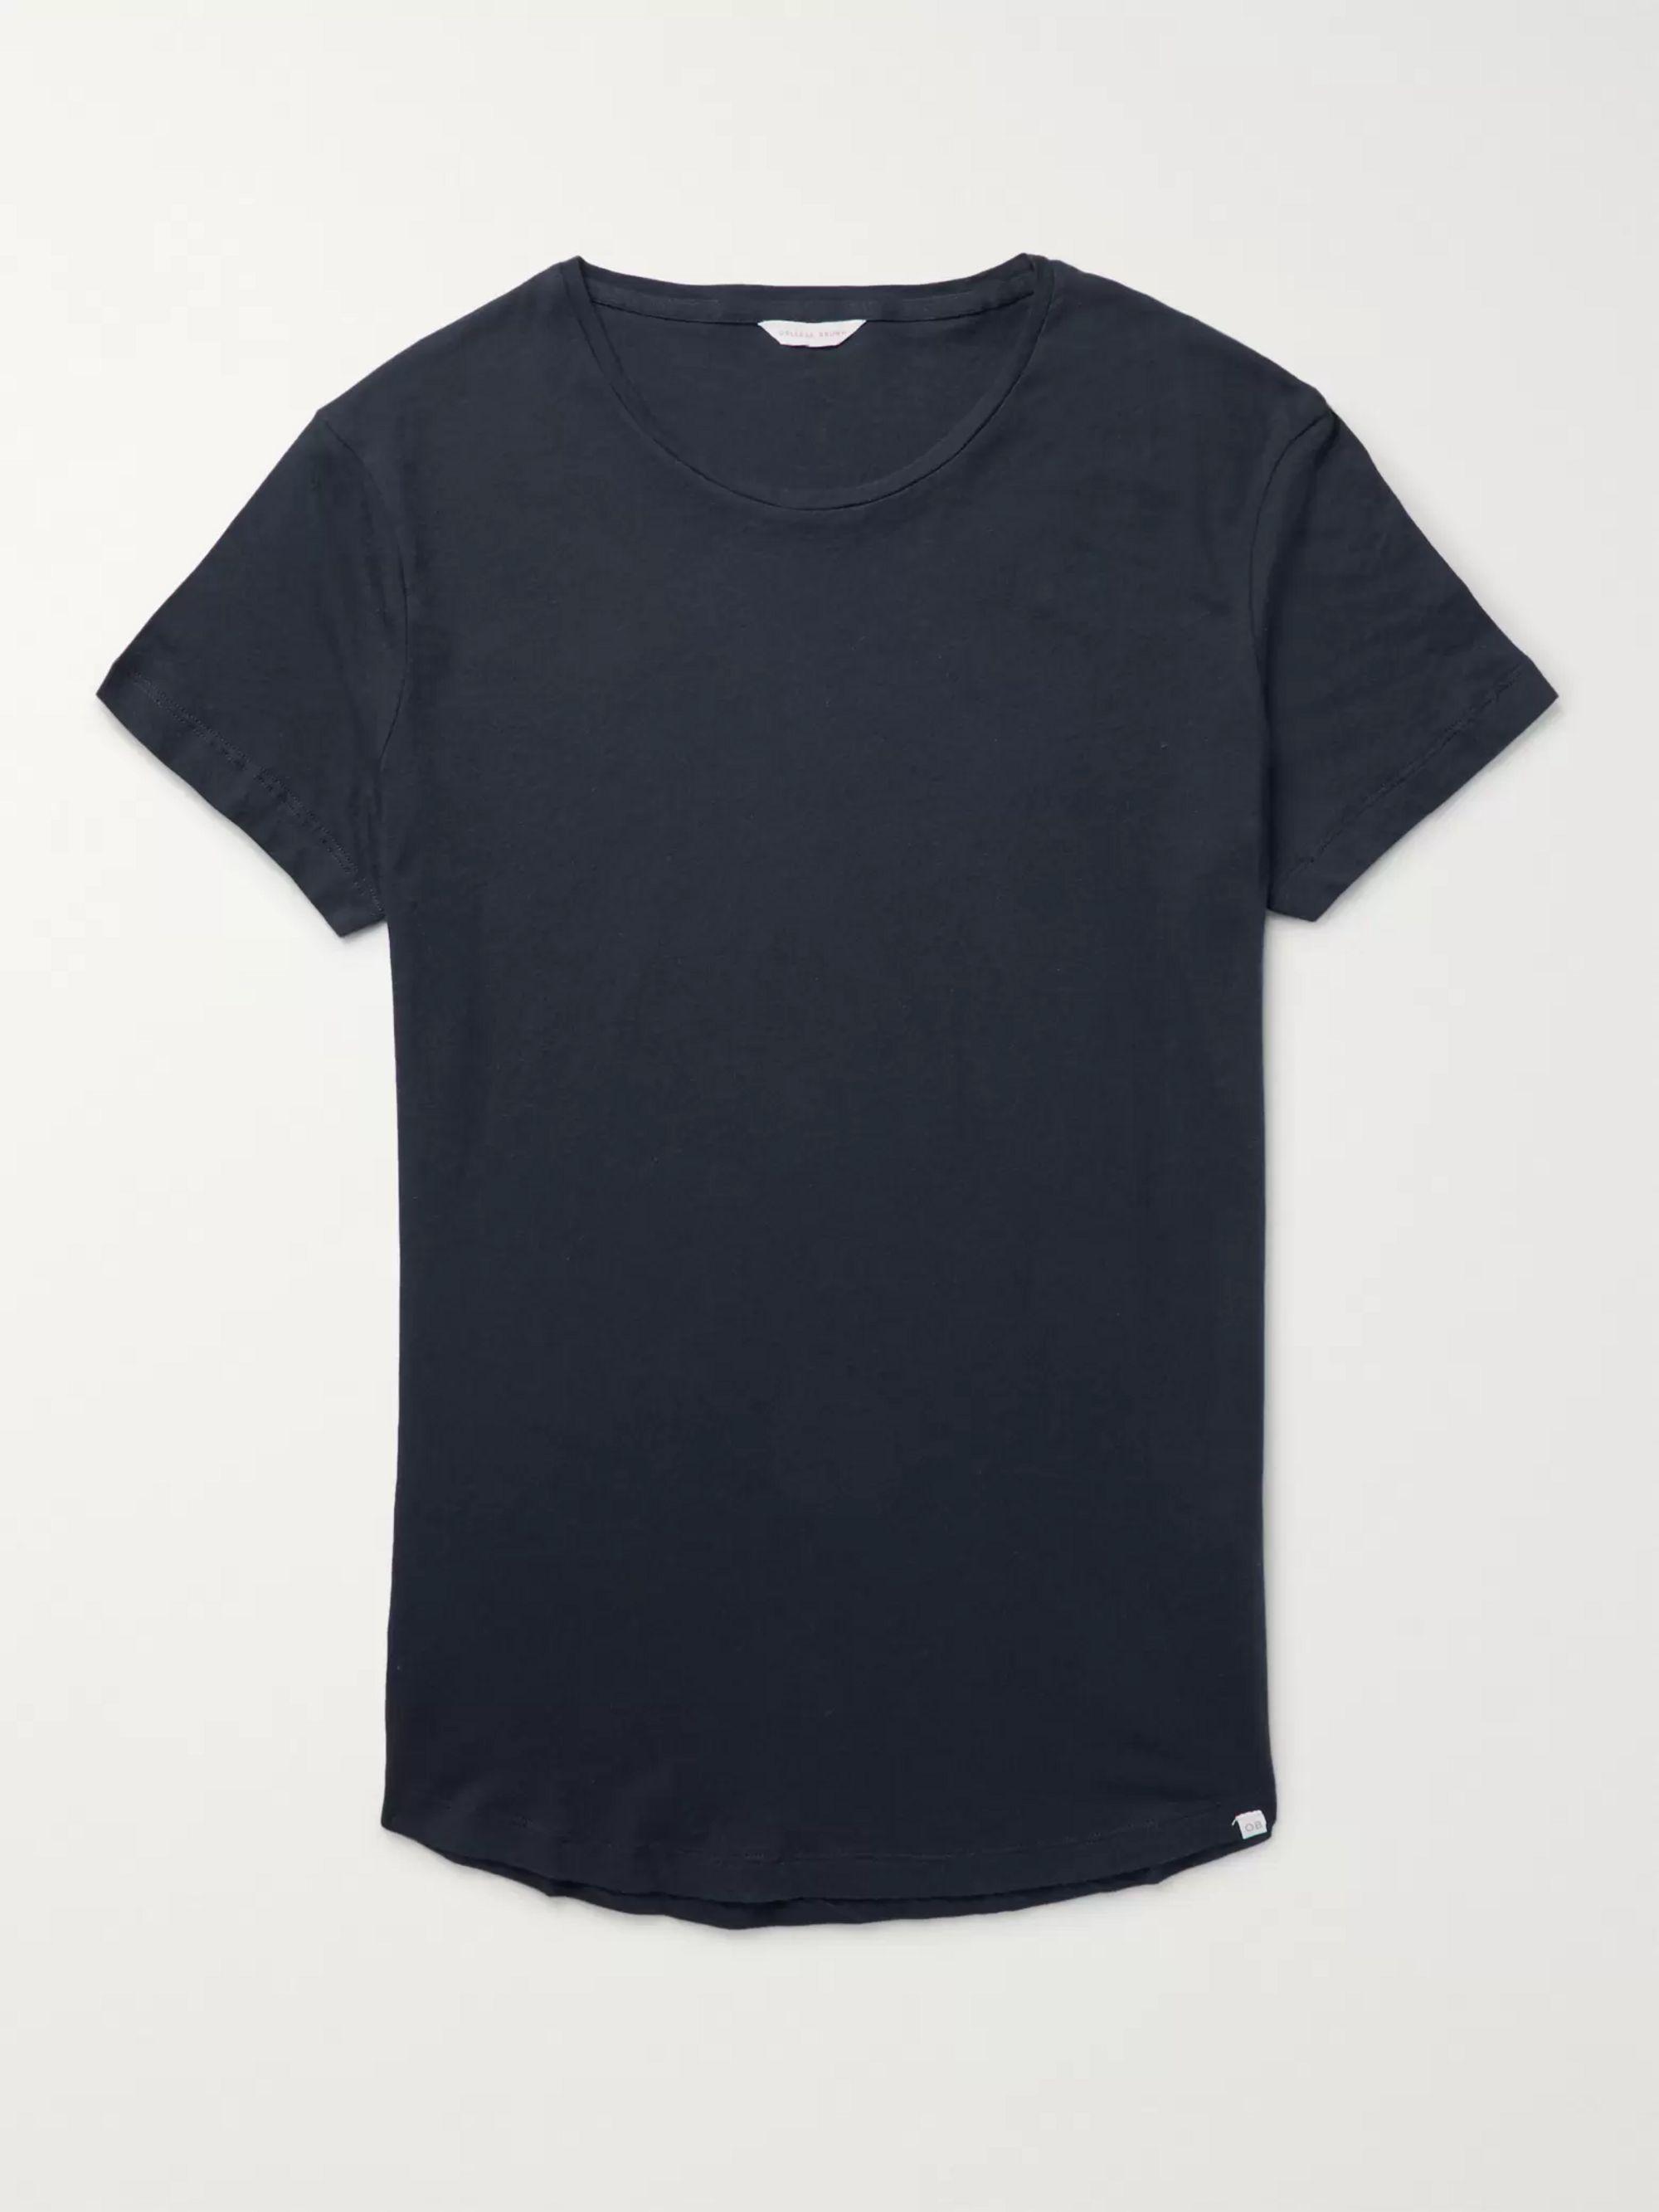 OB T Slim Fit Cotton Jersey T Shirt